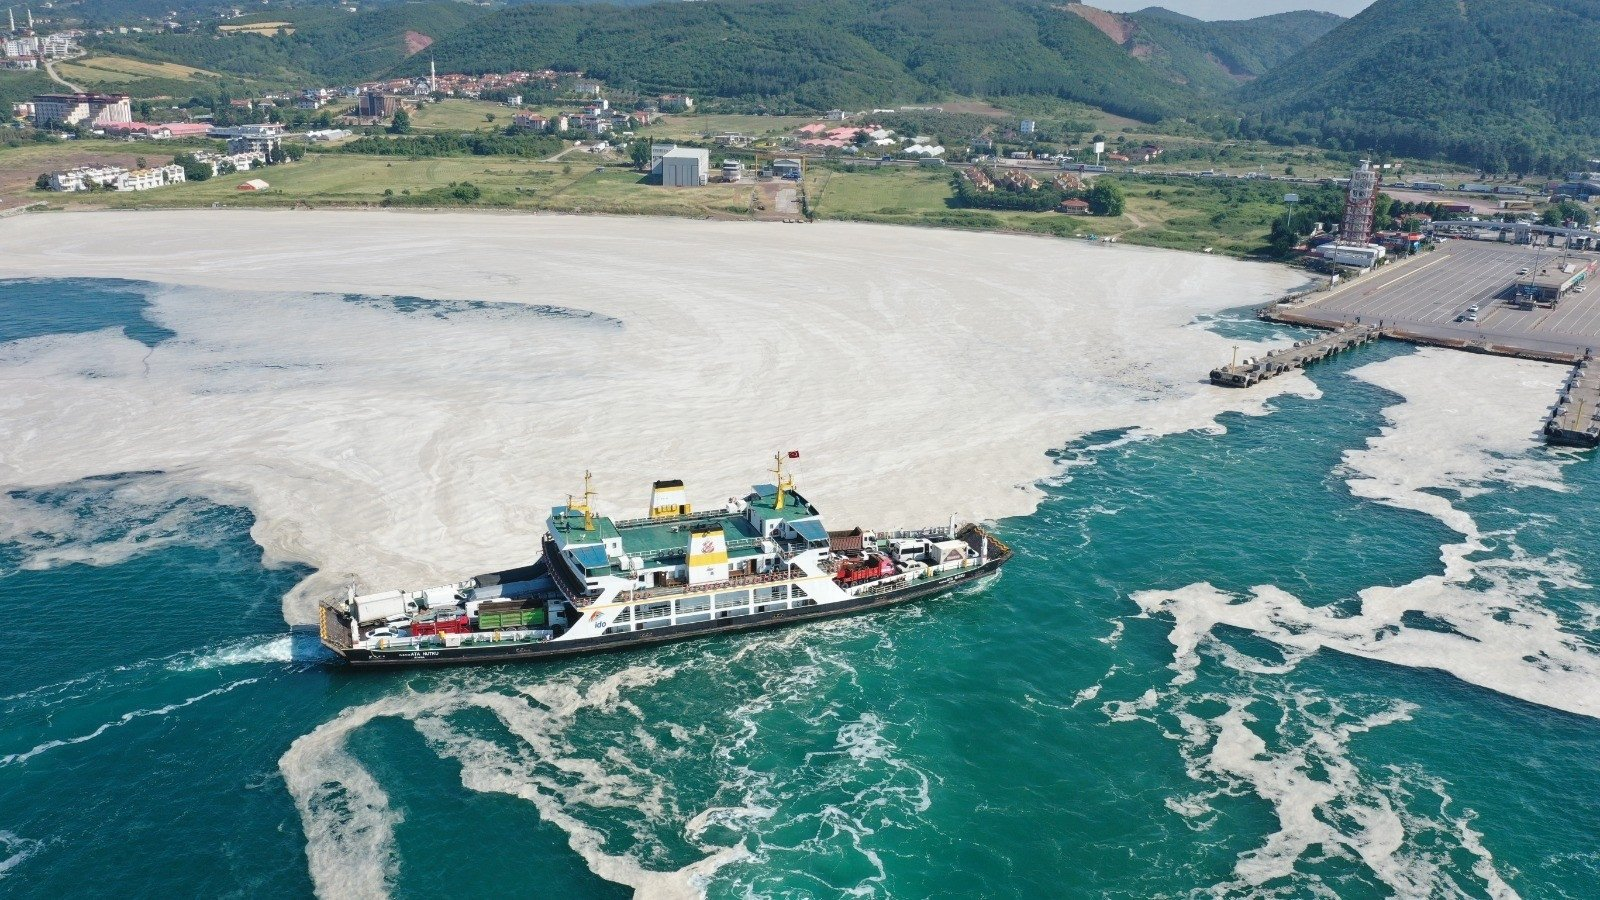 A view of sea snot near the coast, in Yalova, western Turkey, June 12, 2021. (İHA PHOTO)